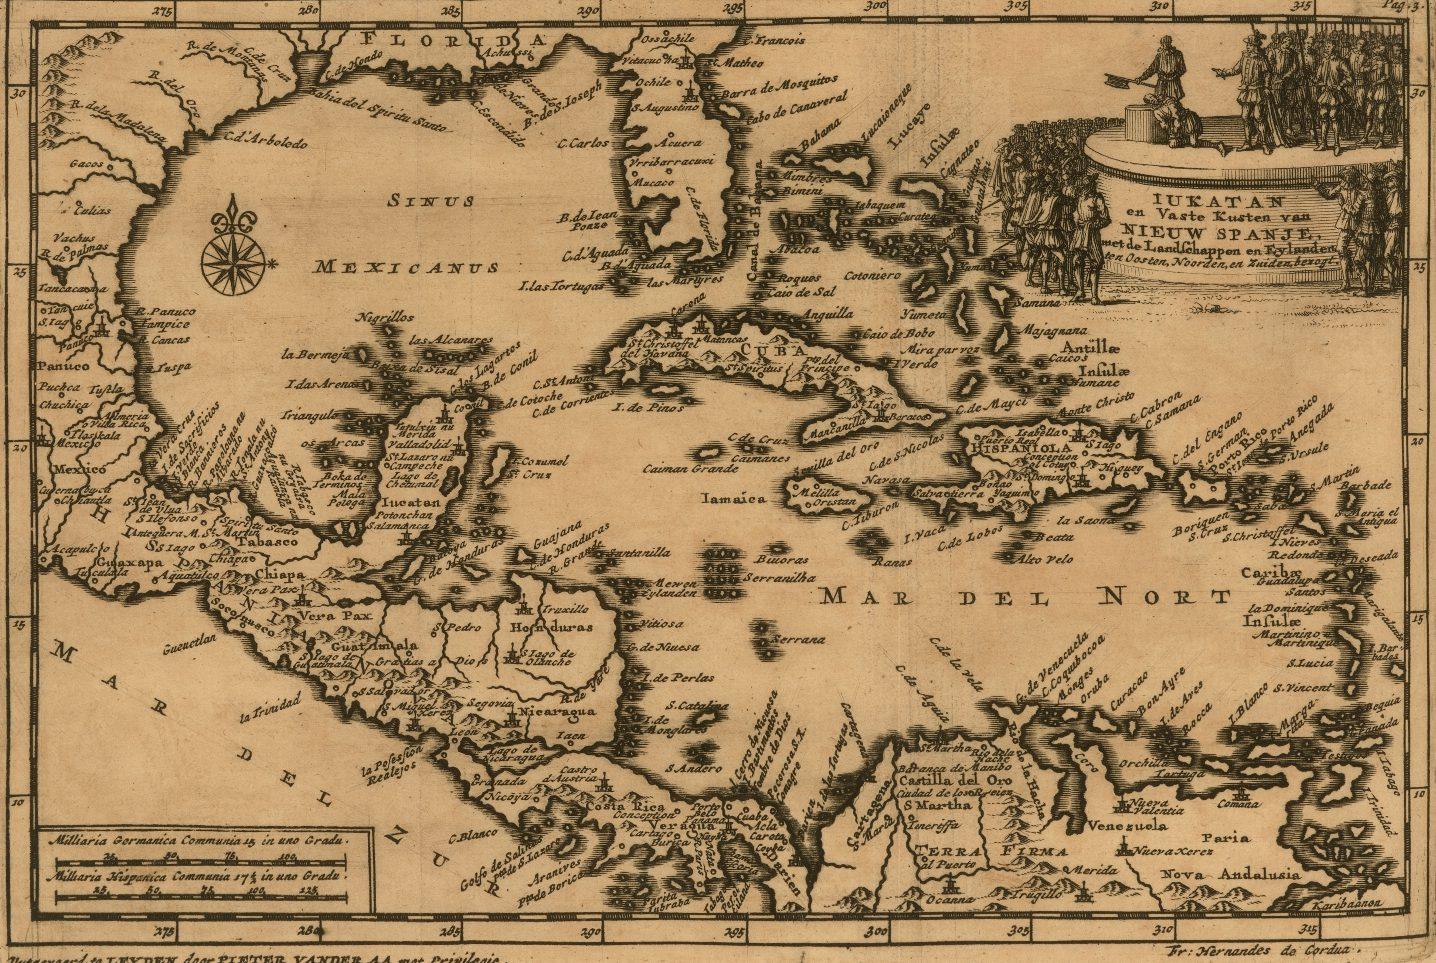 Caribbean Reformations